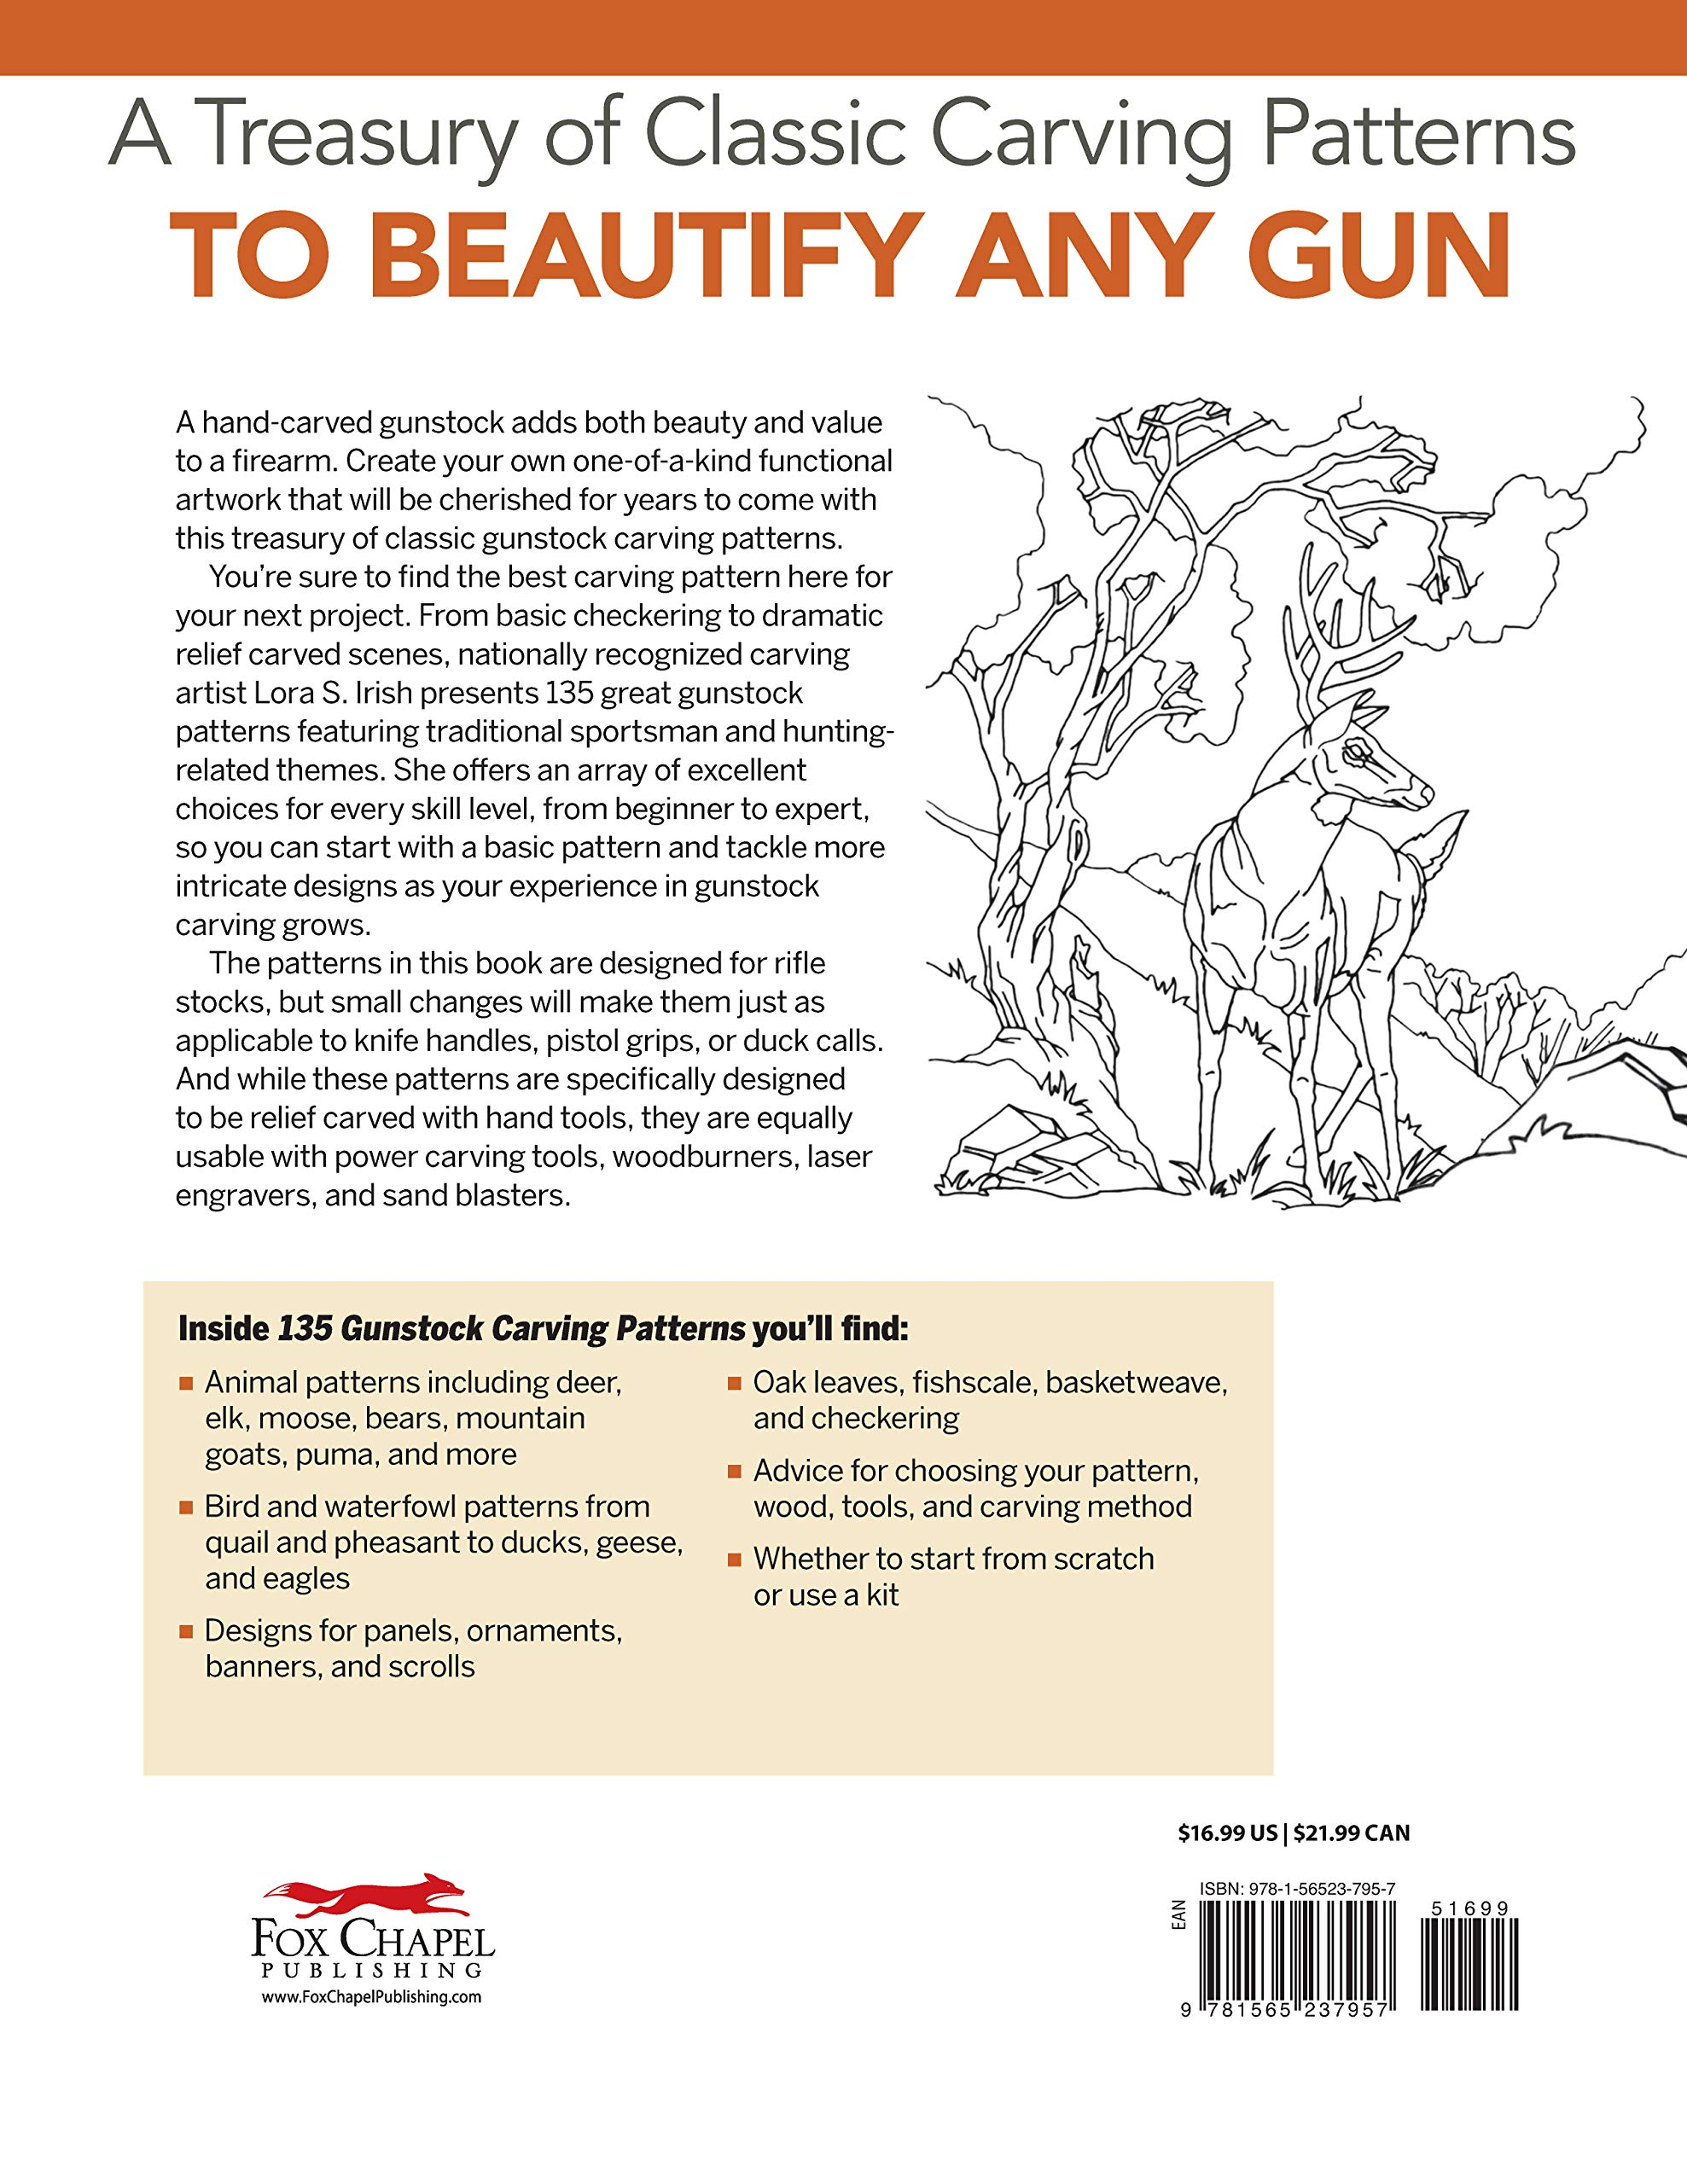 135 Gunstock Carving Patterns (Fox Chapel Publishing) A